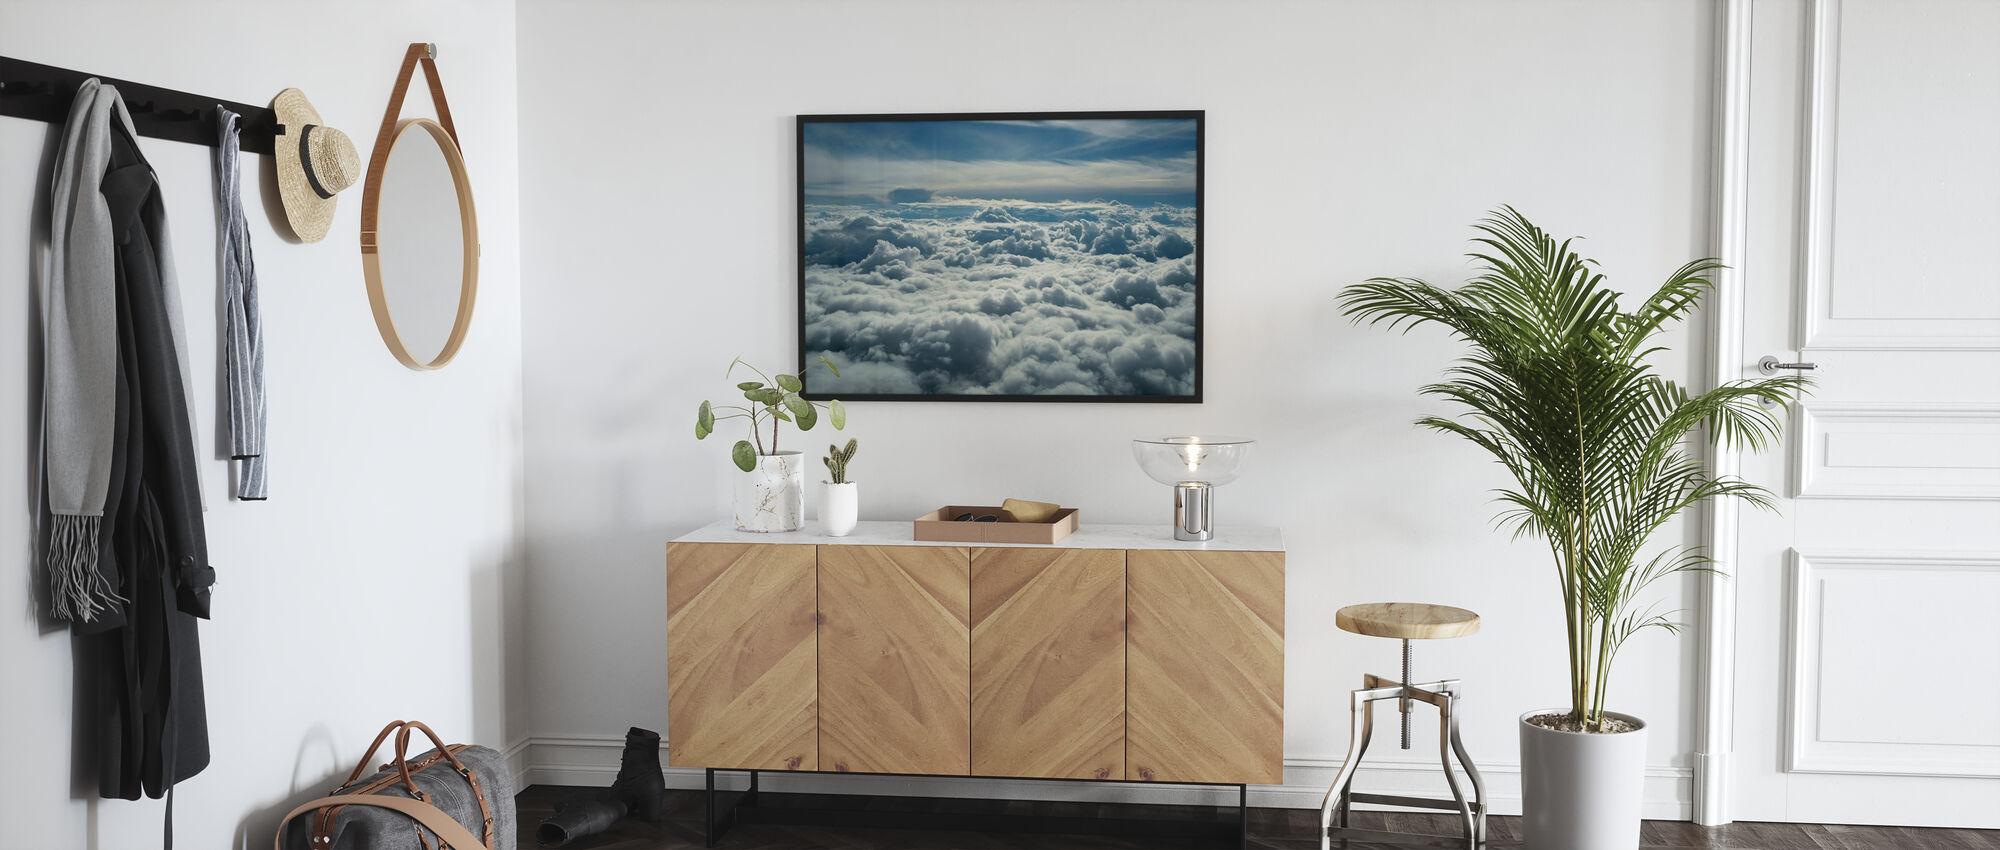 Sopra nuvole - Poster - Sala